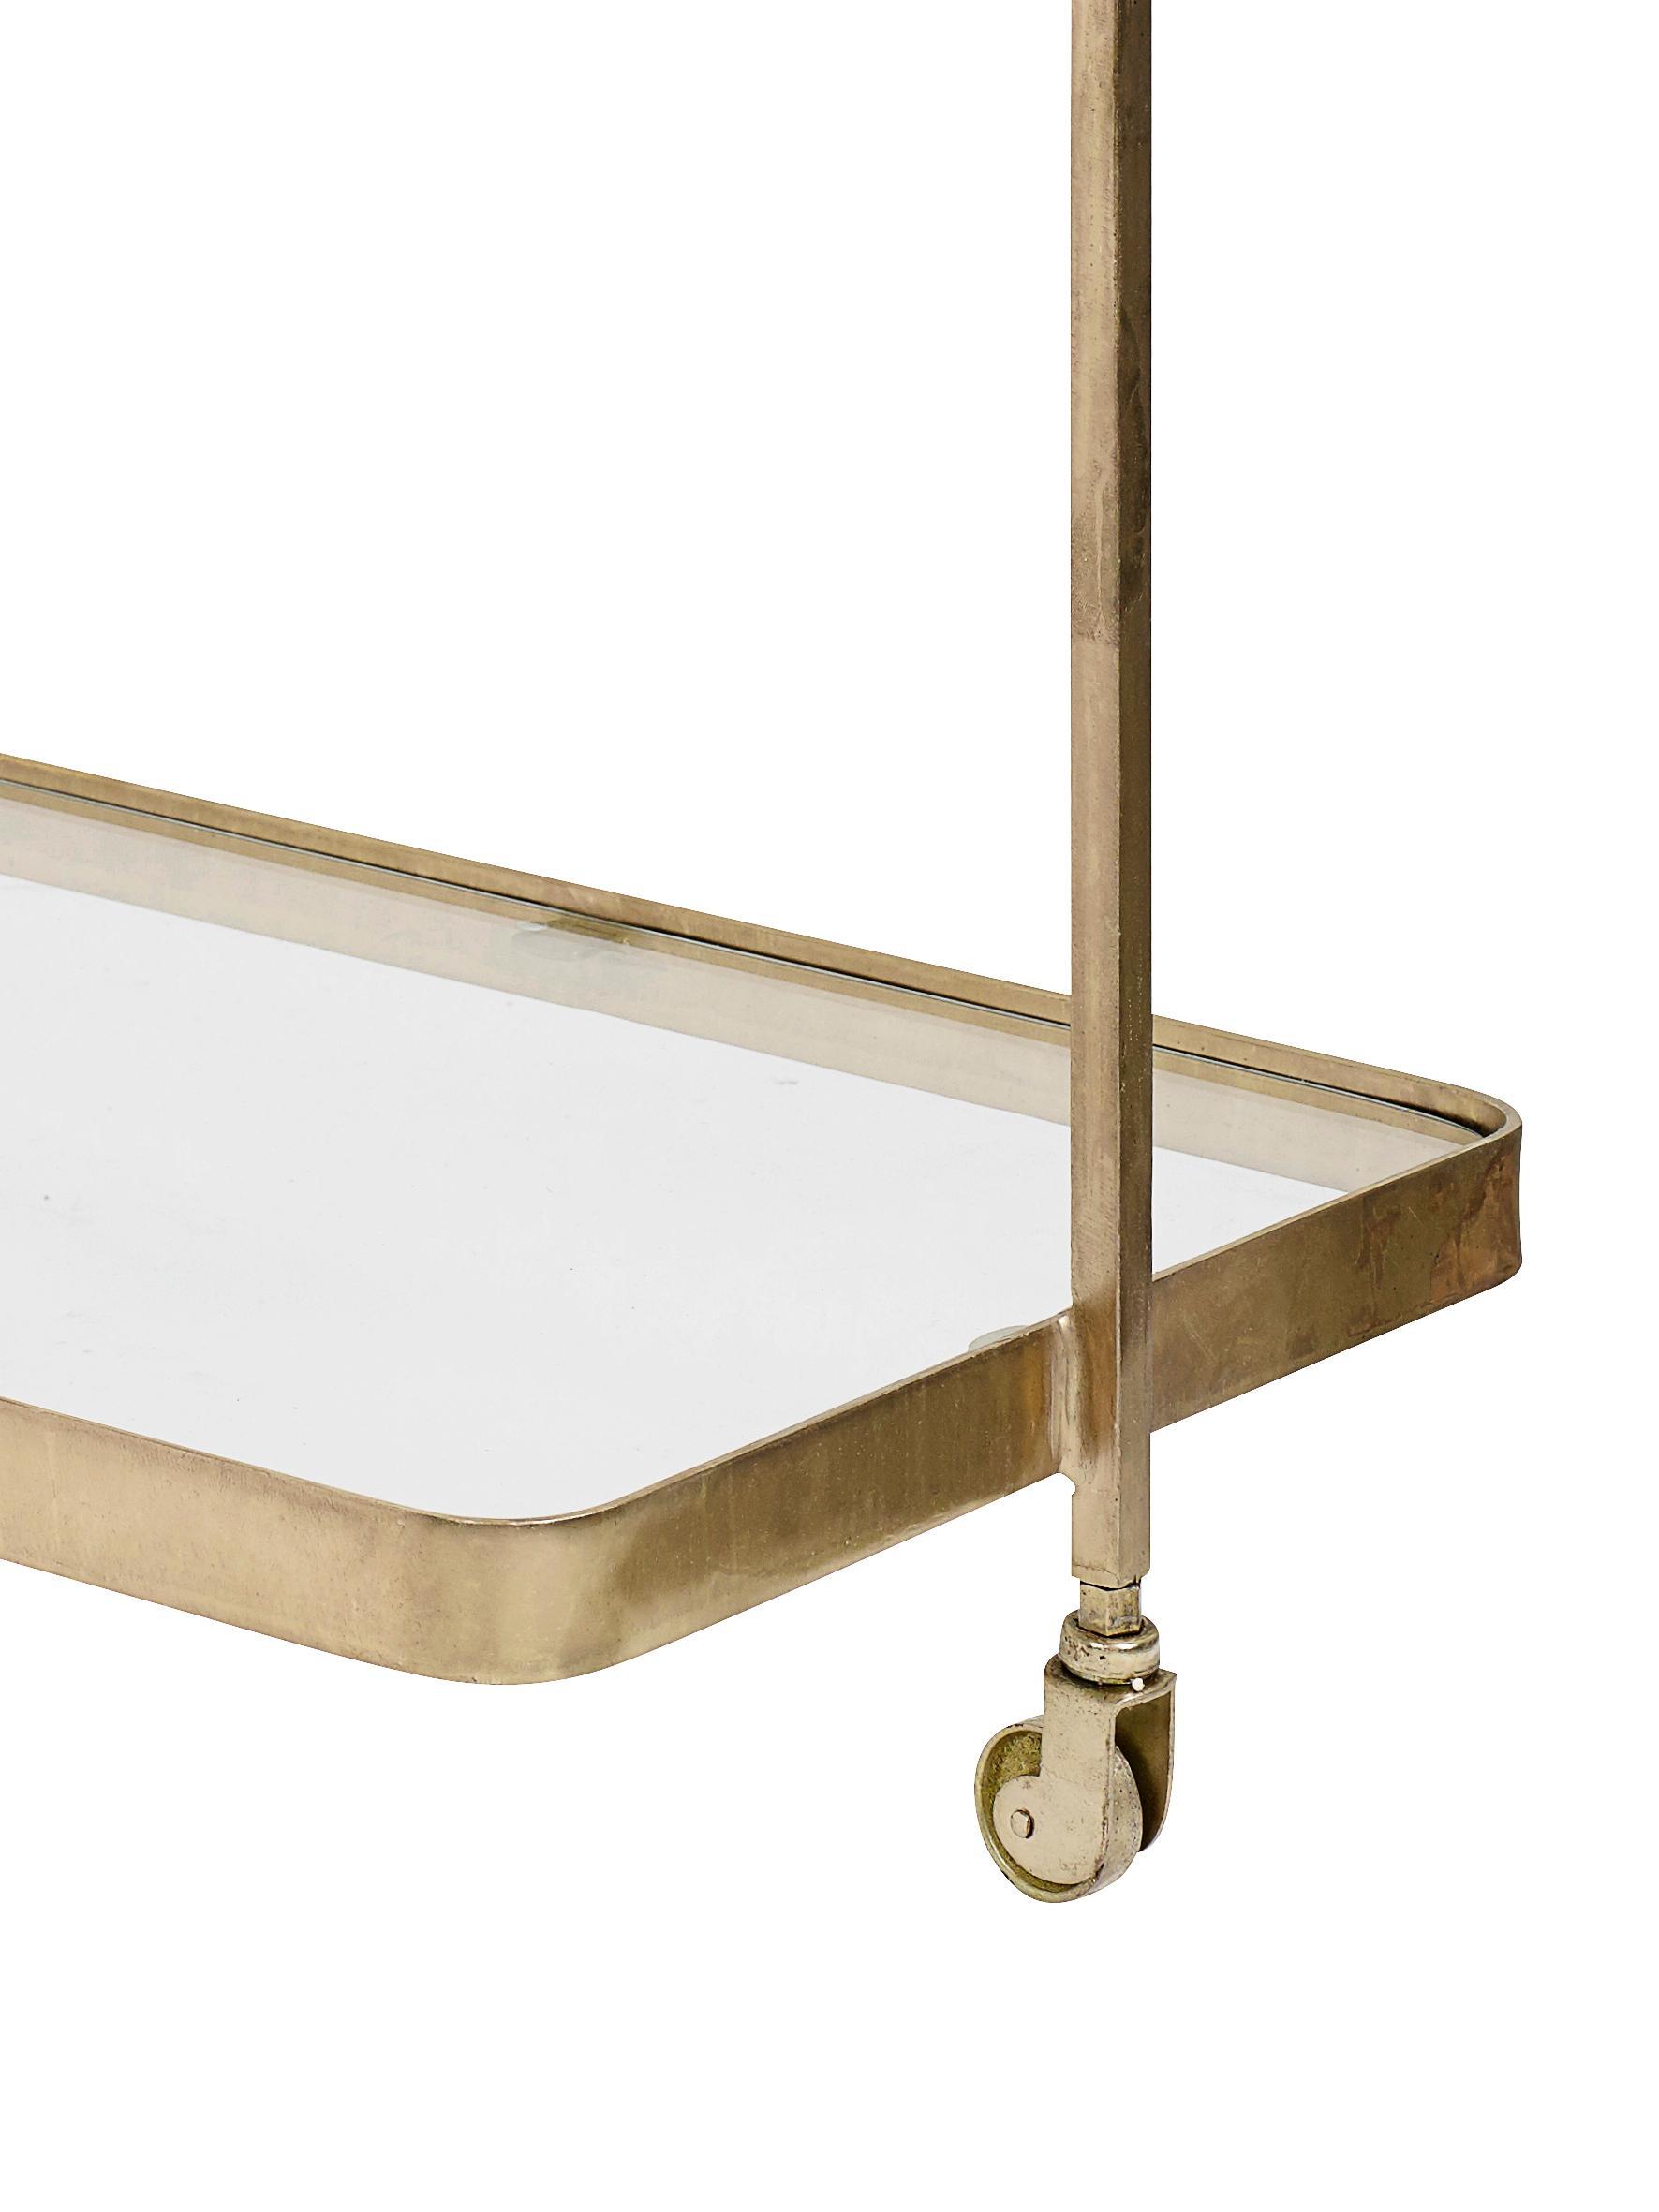 Metalen barcart Troy met glazen plateaus, Frame: vermessingd metaal, Plateaus: glas, Goudkleurig, 70 x 75 cm